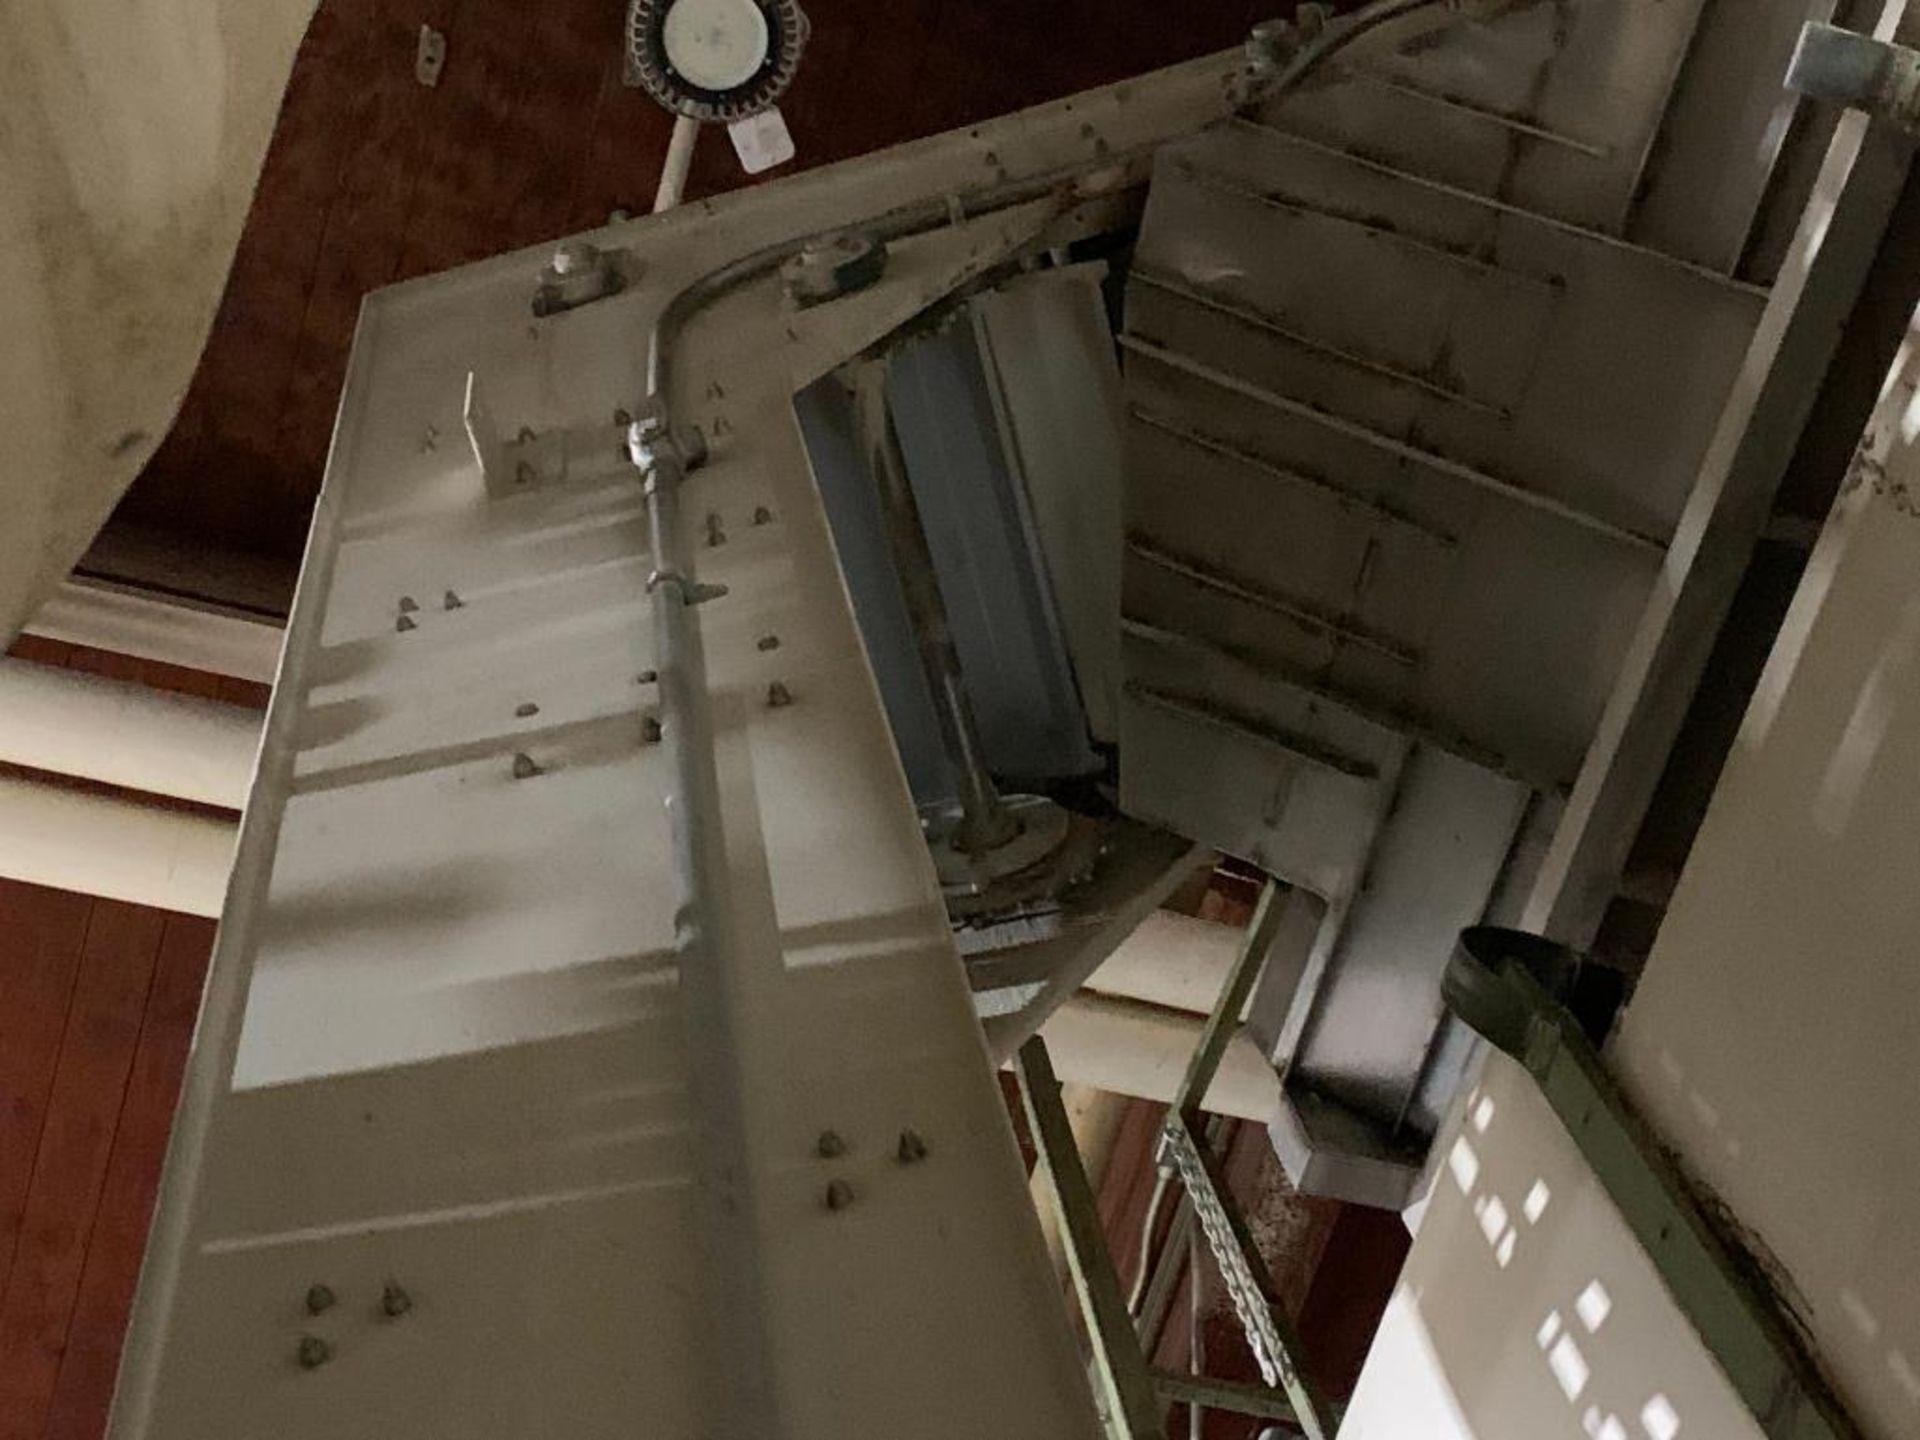 Meyer overlapping bucket elevator, model PA462-24-S - Image 12 of 14